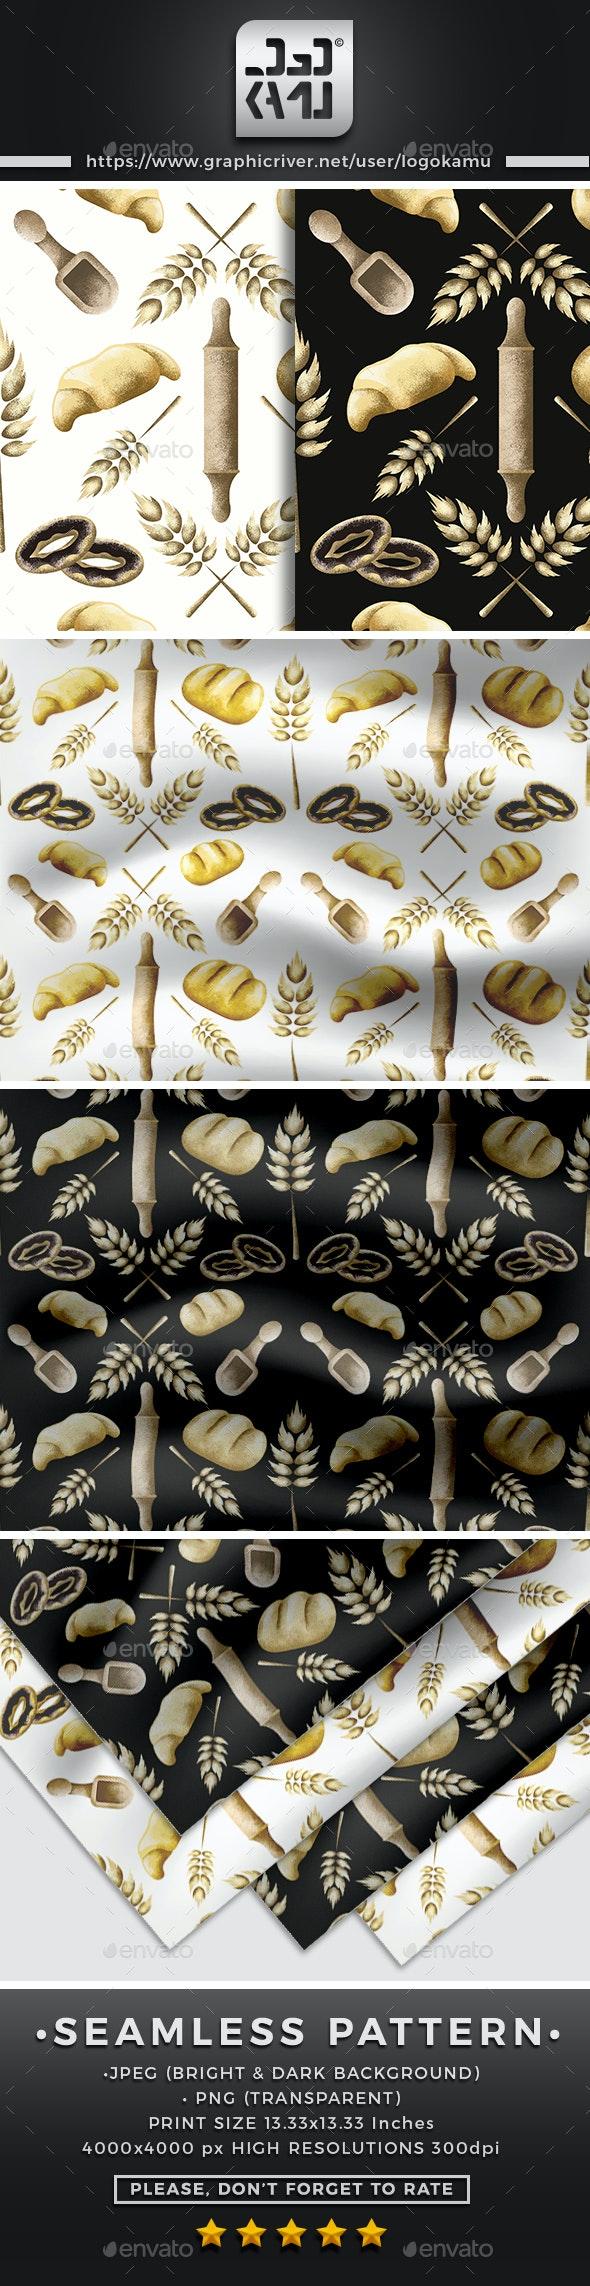 Bakery Seamless Pattern - Patterns Backgrounds